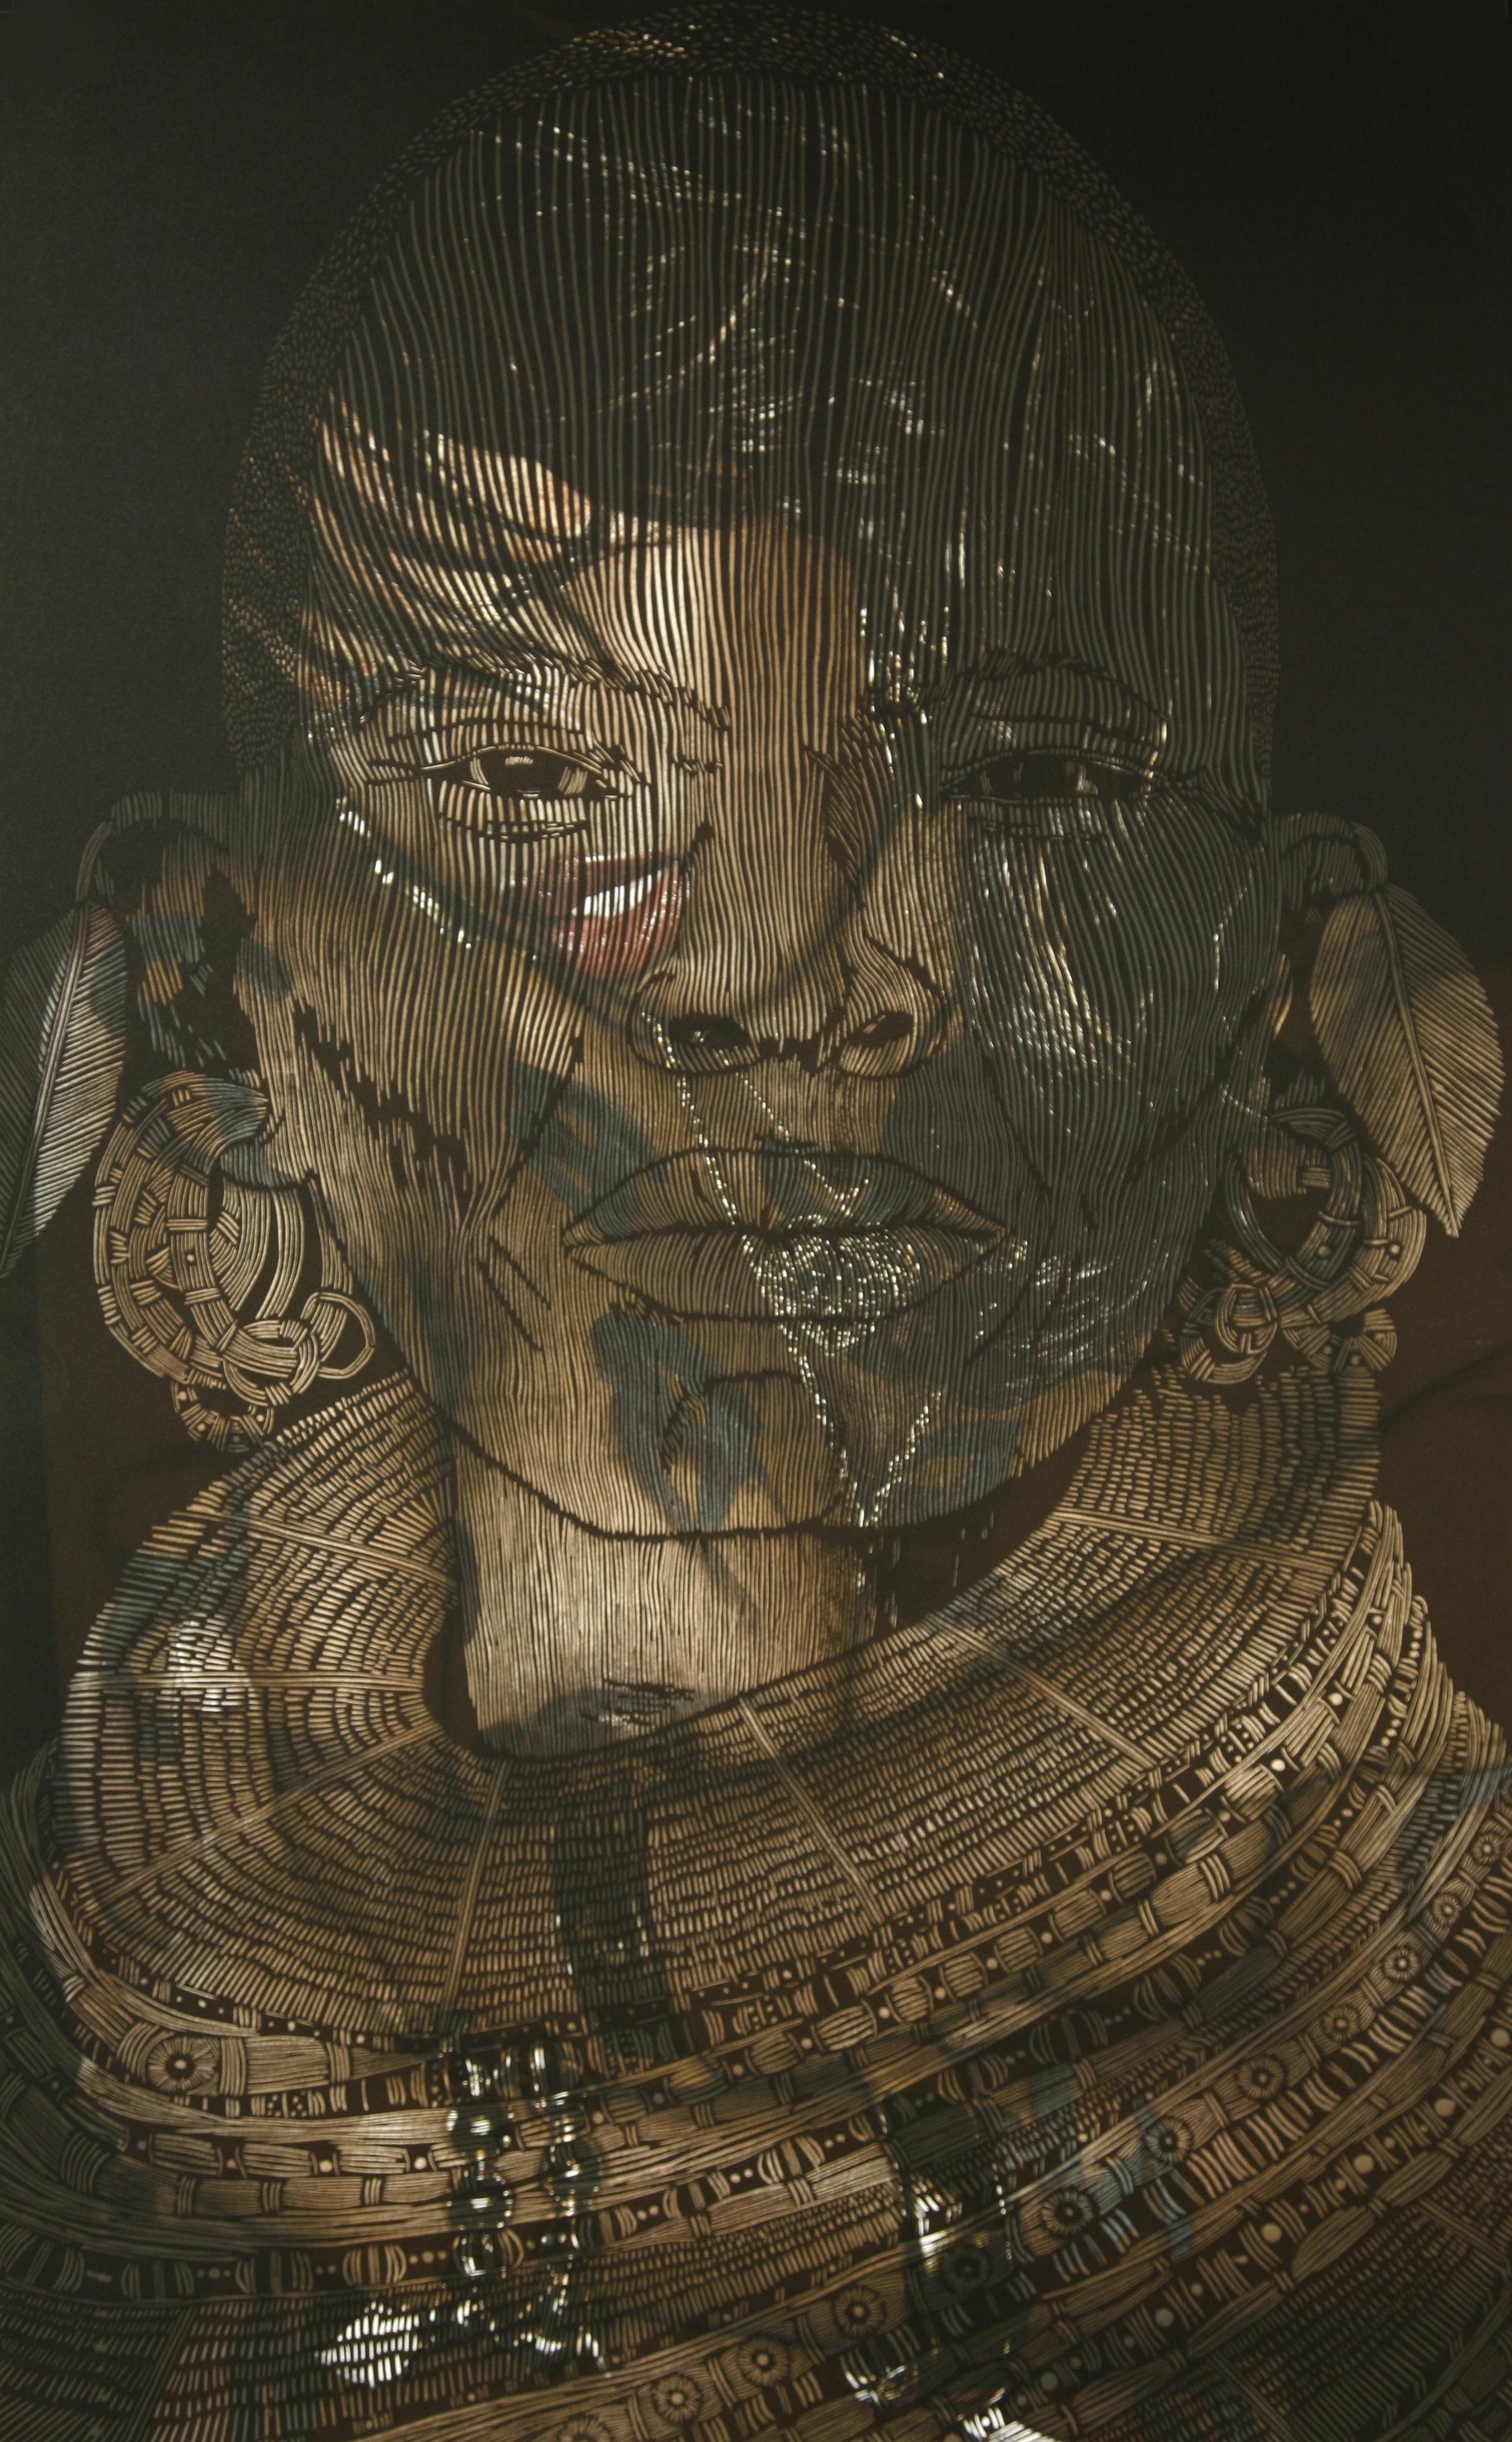 ''Untitled Cut, Fachon/ My Two World' woodblock layered on digital photograph